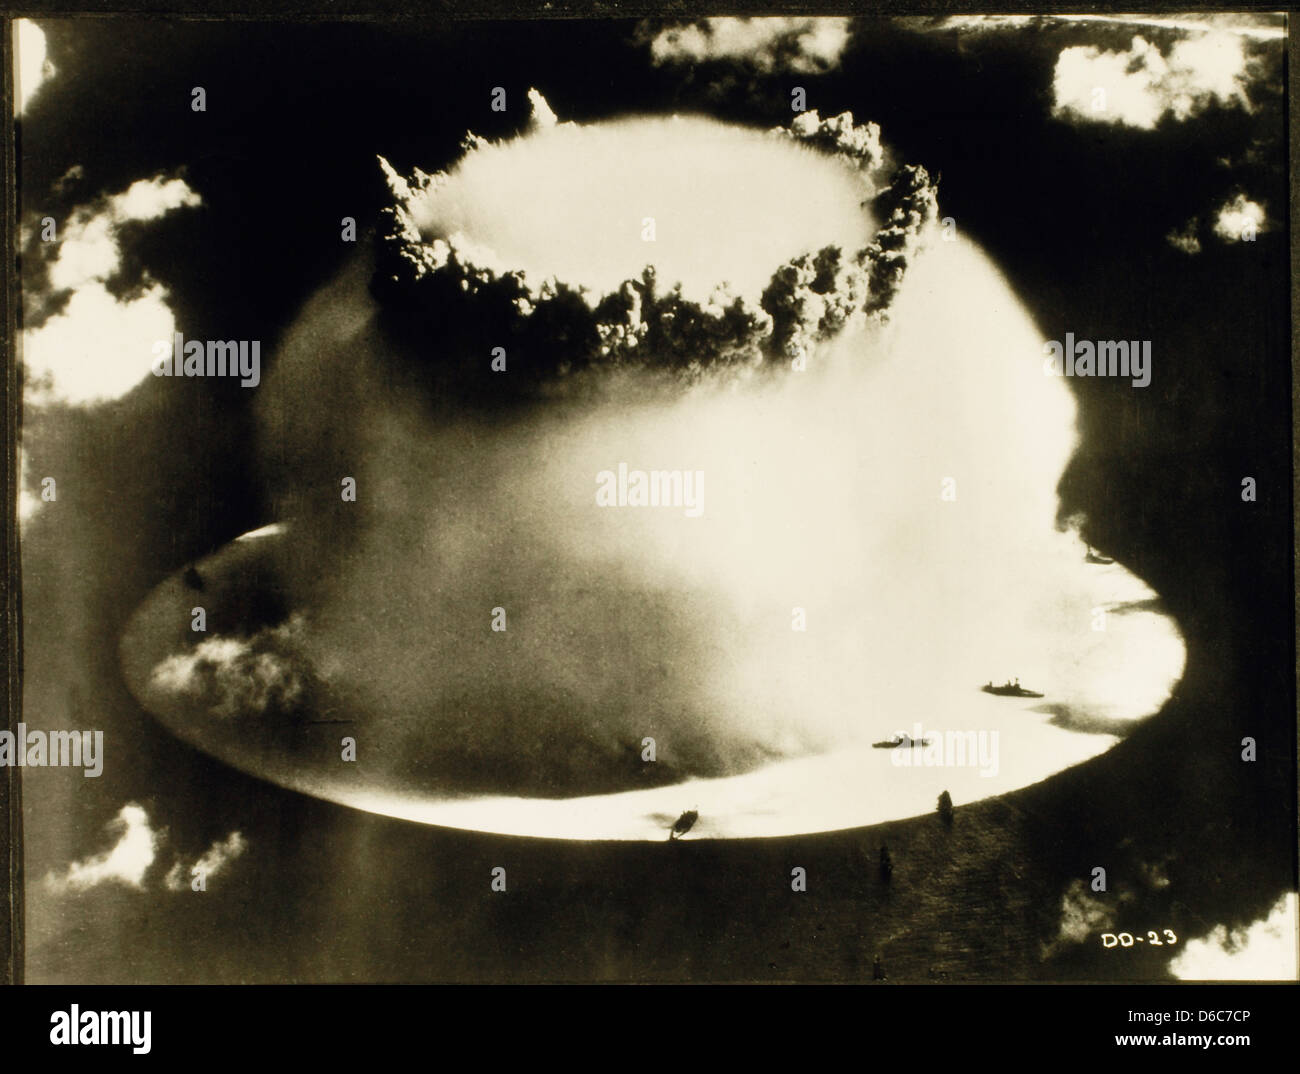 Atomic Bomb Test, Bikini Atoll, 1946 - Stock Image